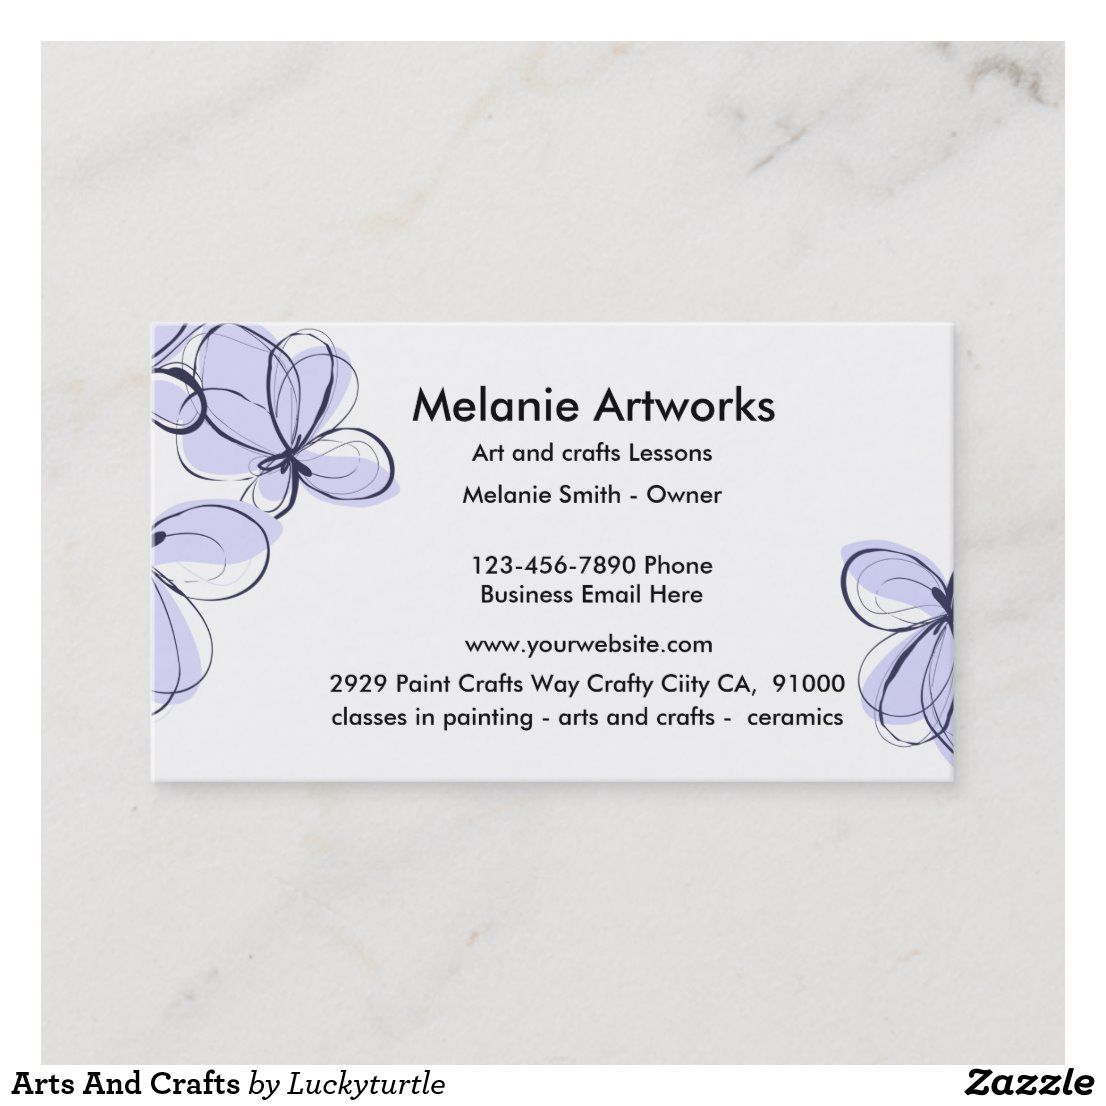 Arts And Crafts Business Card Zazzle Com Craft Business Cards Craft Business Arts And Crafts